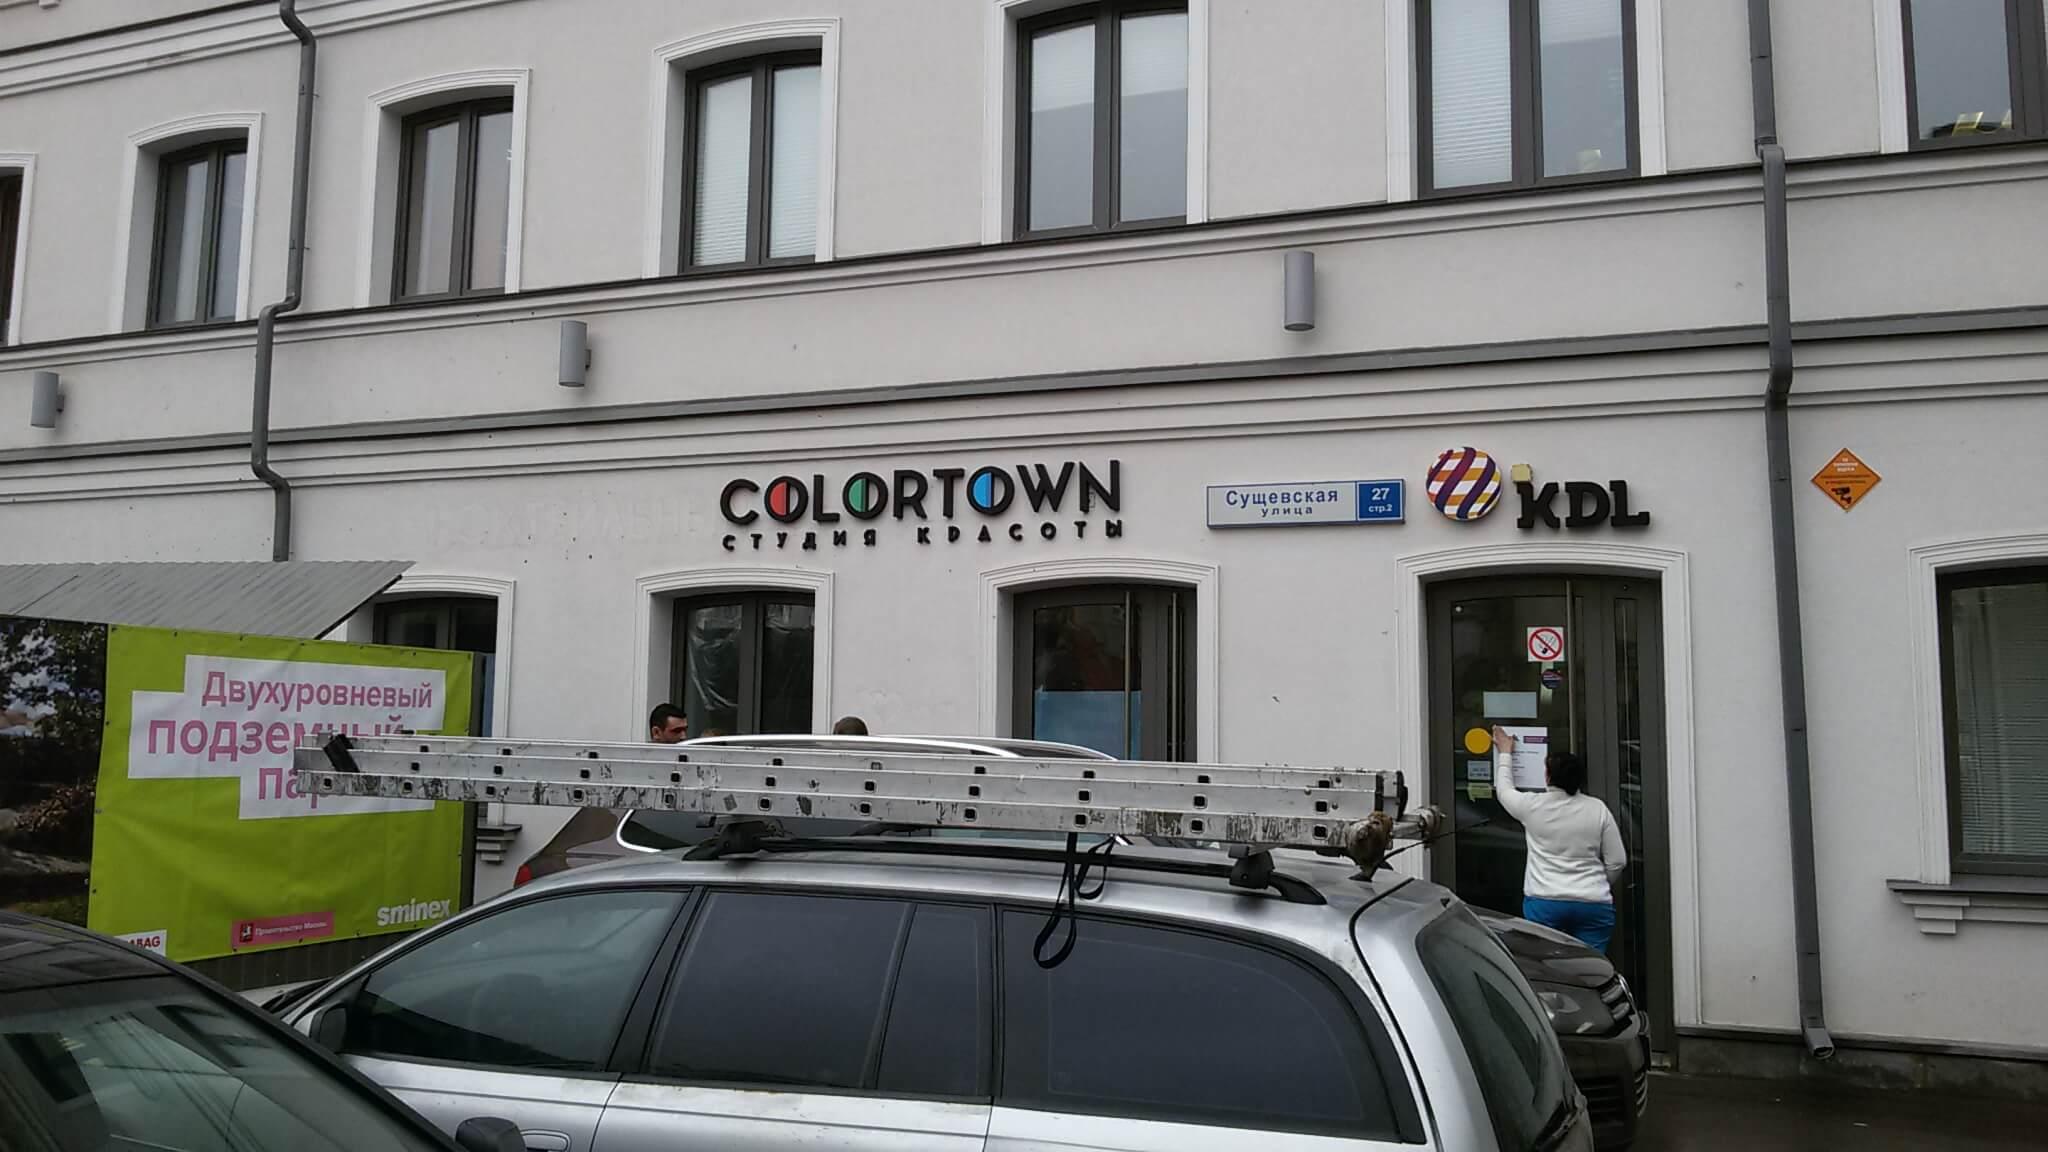 COLORTOWN-объемные не световые буквы